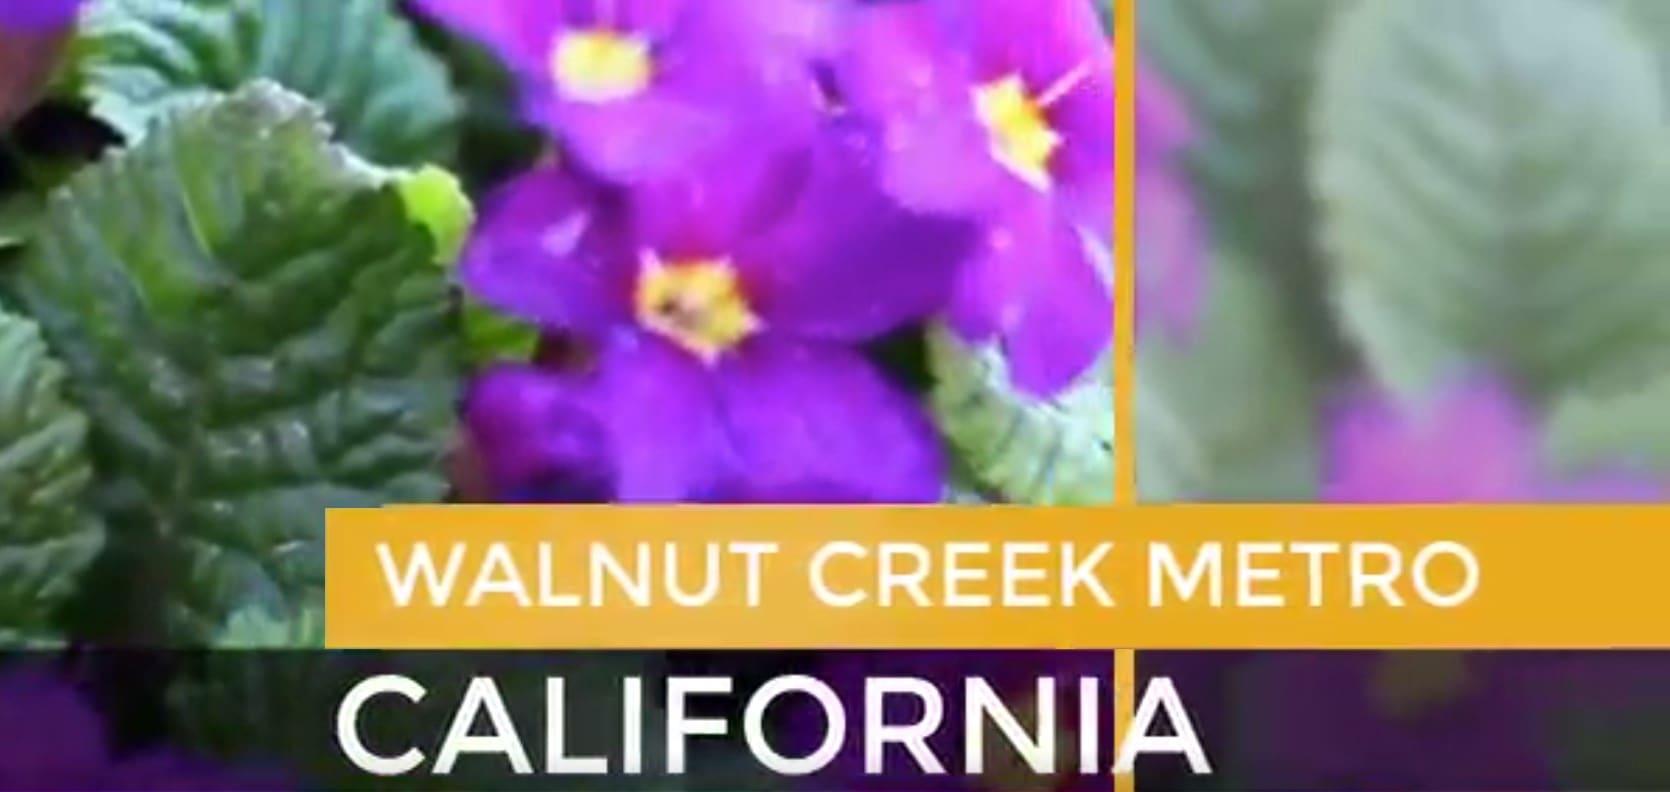 Walnut Creek Metro video preview